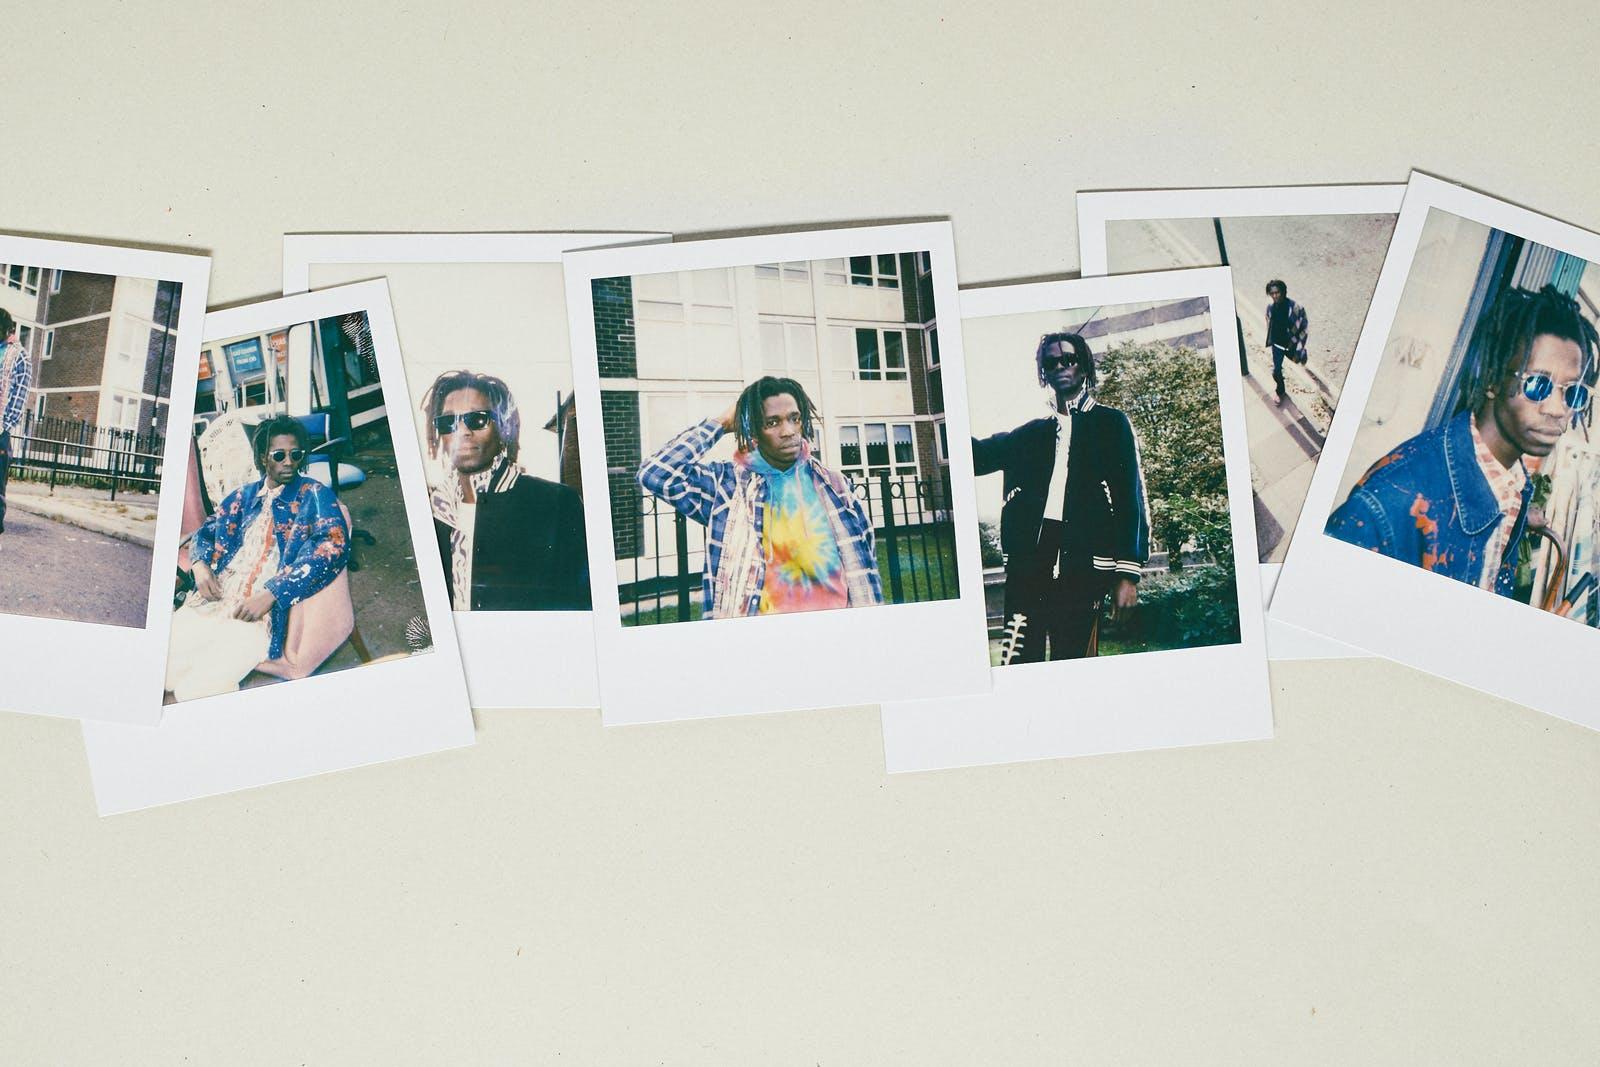 Needles AW19 polaroid selection featuring tie dyed garments